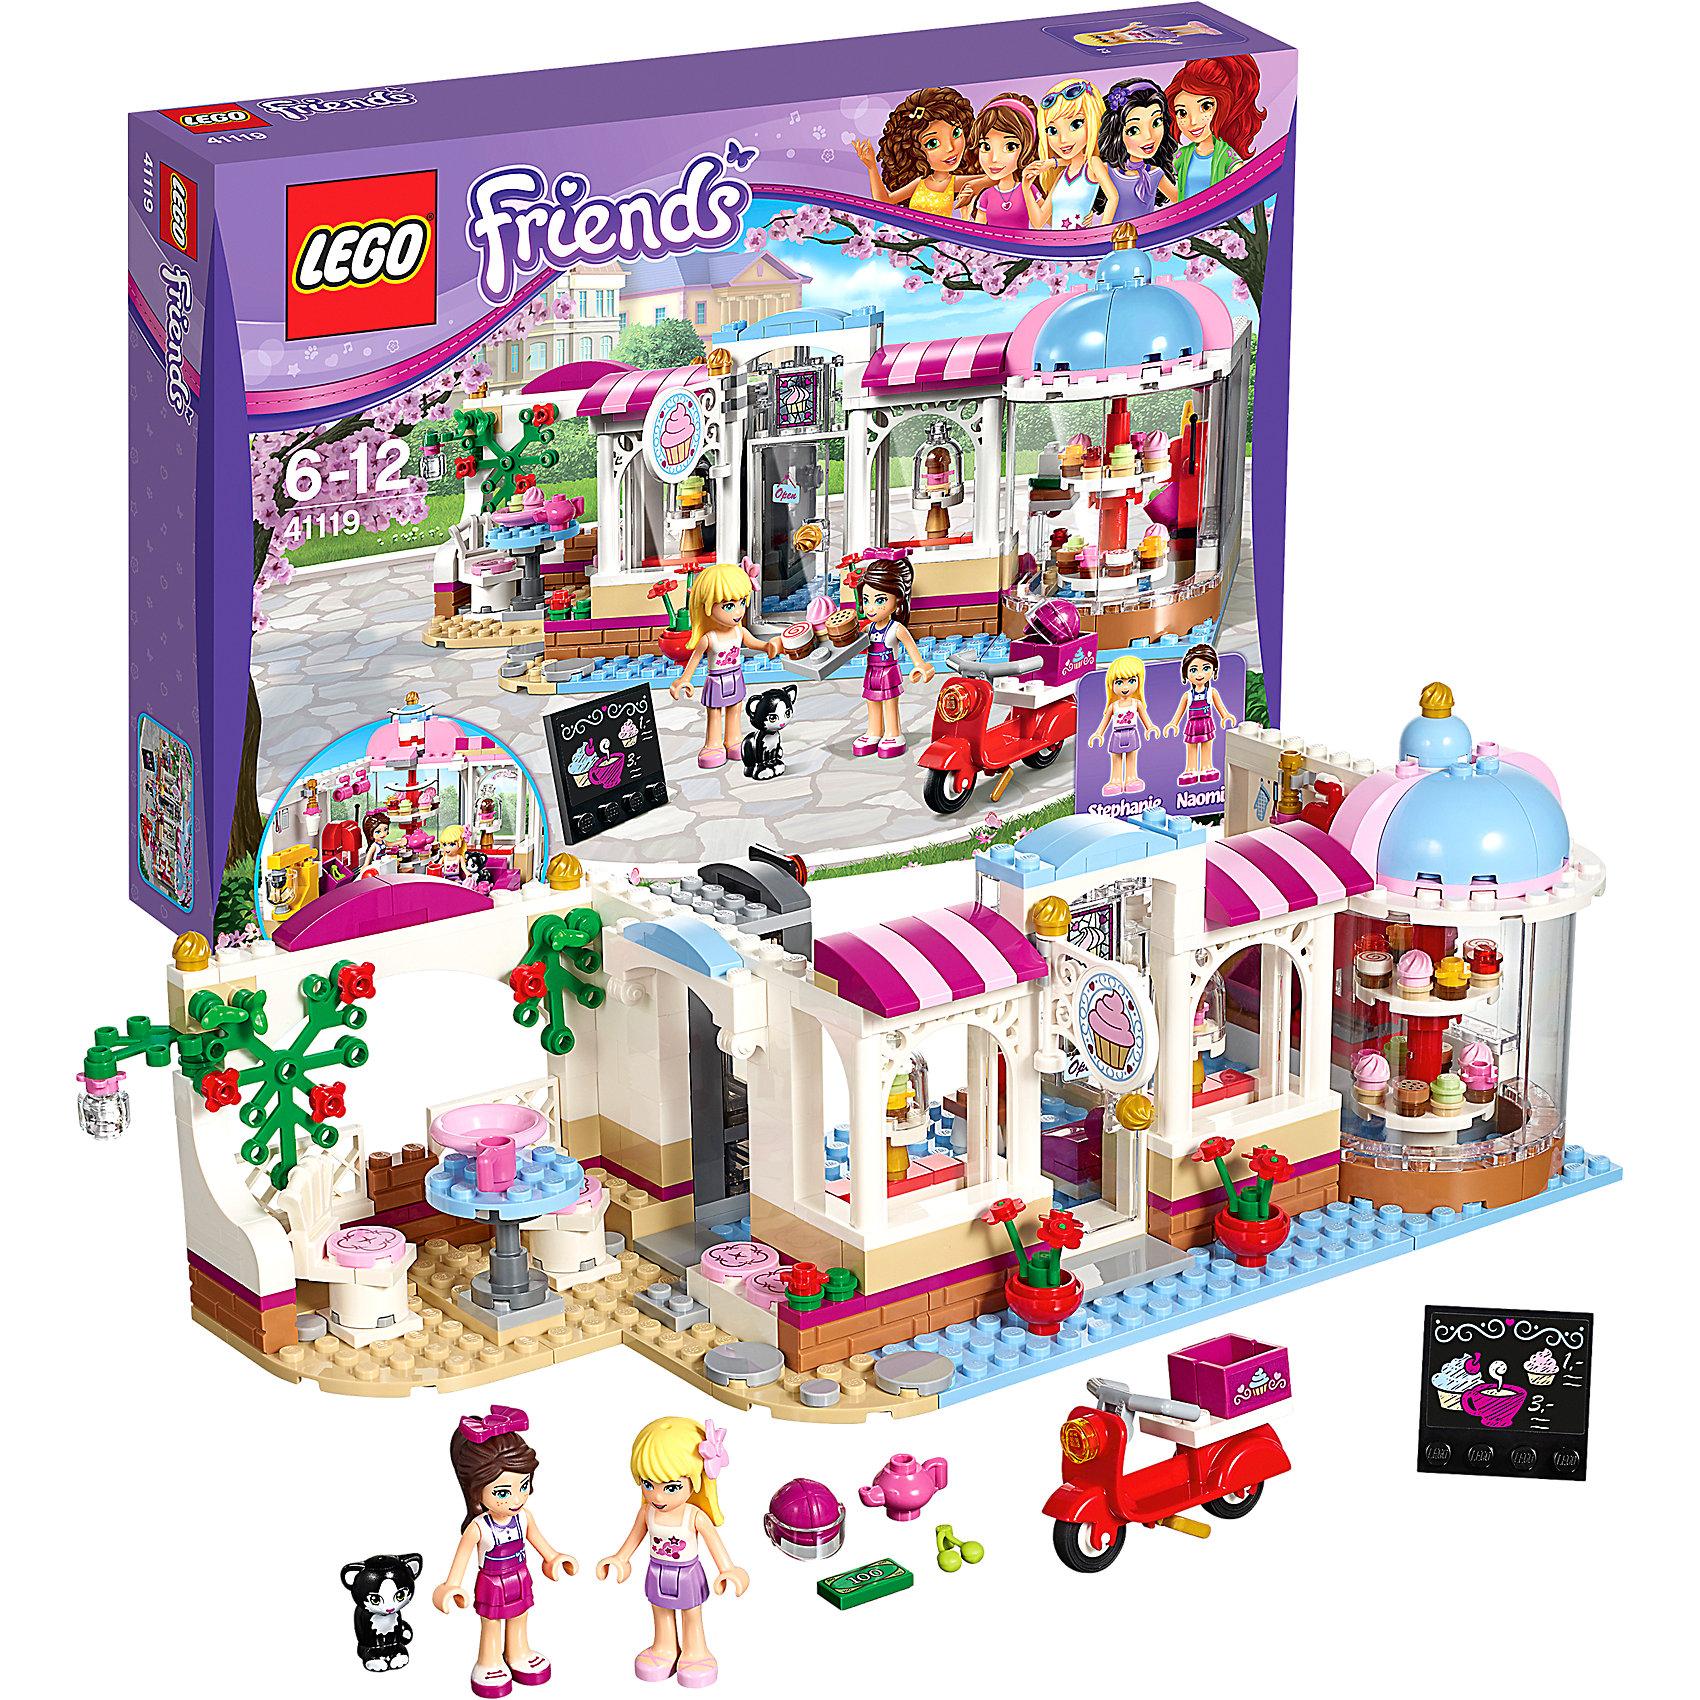 LEGO LEGO Friends 41119: Кондитерская кондитерская мастика купить в днепропетровске